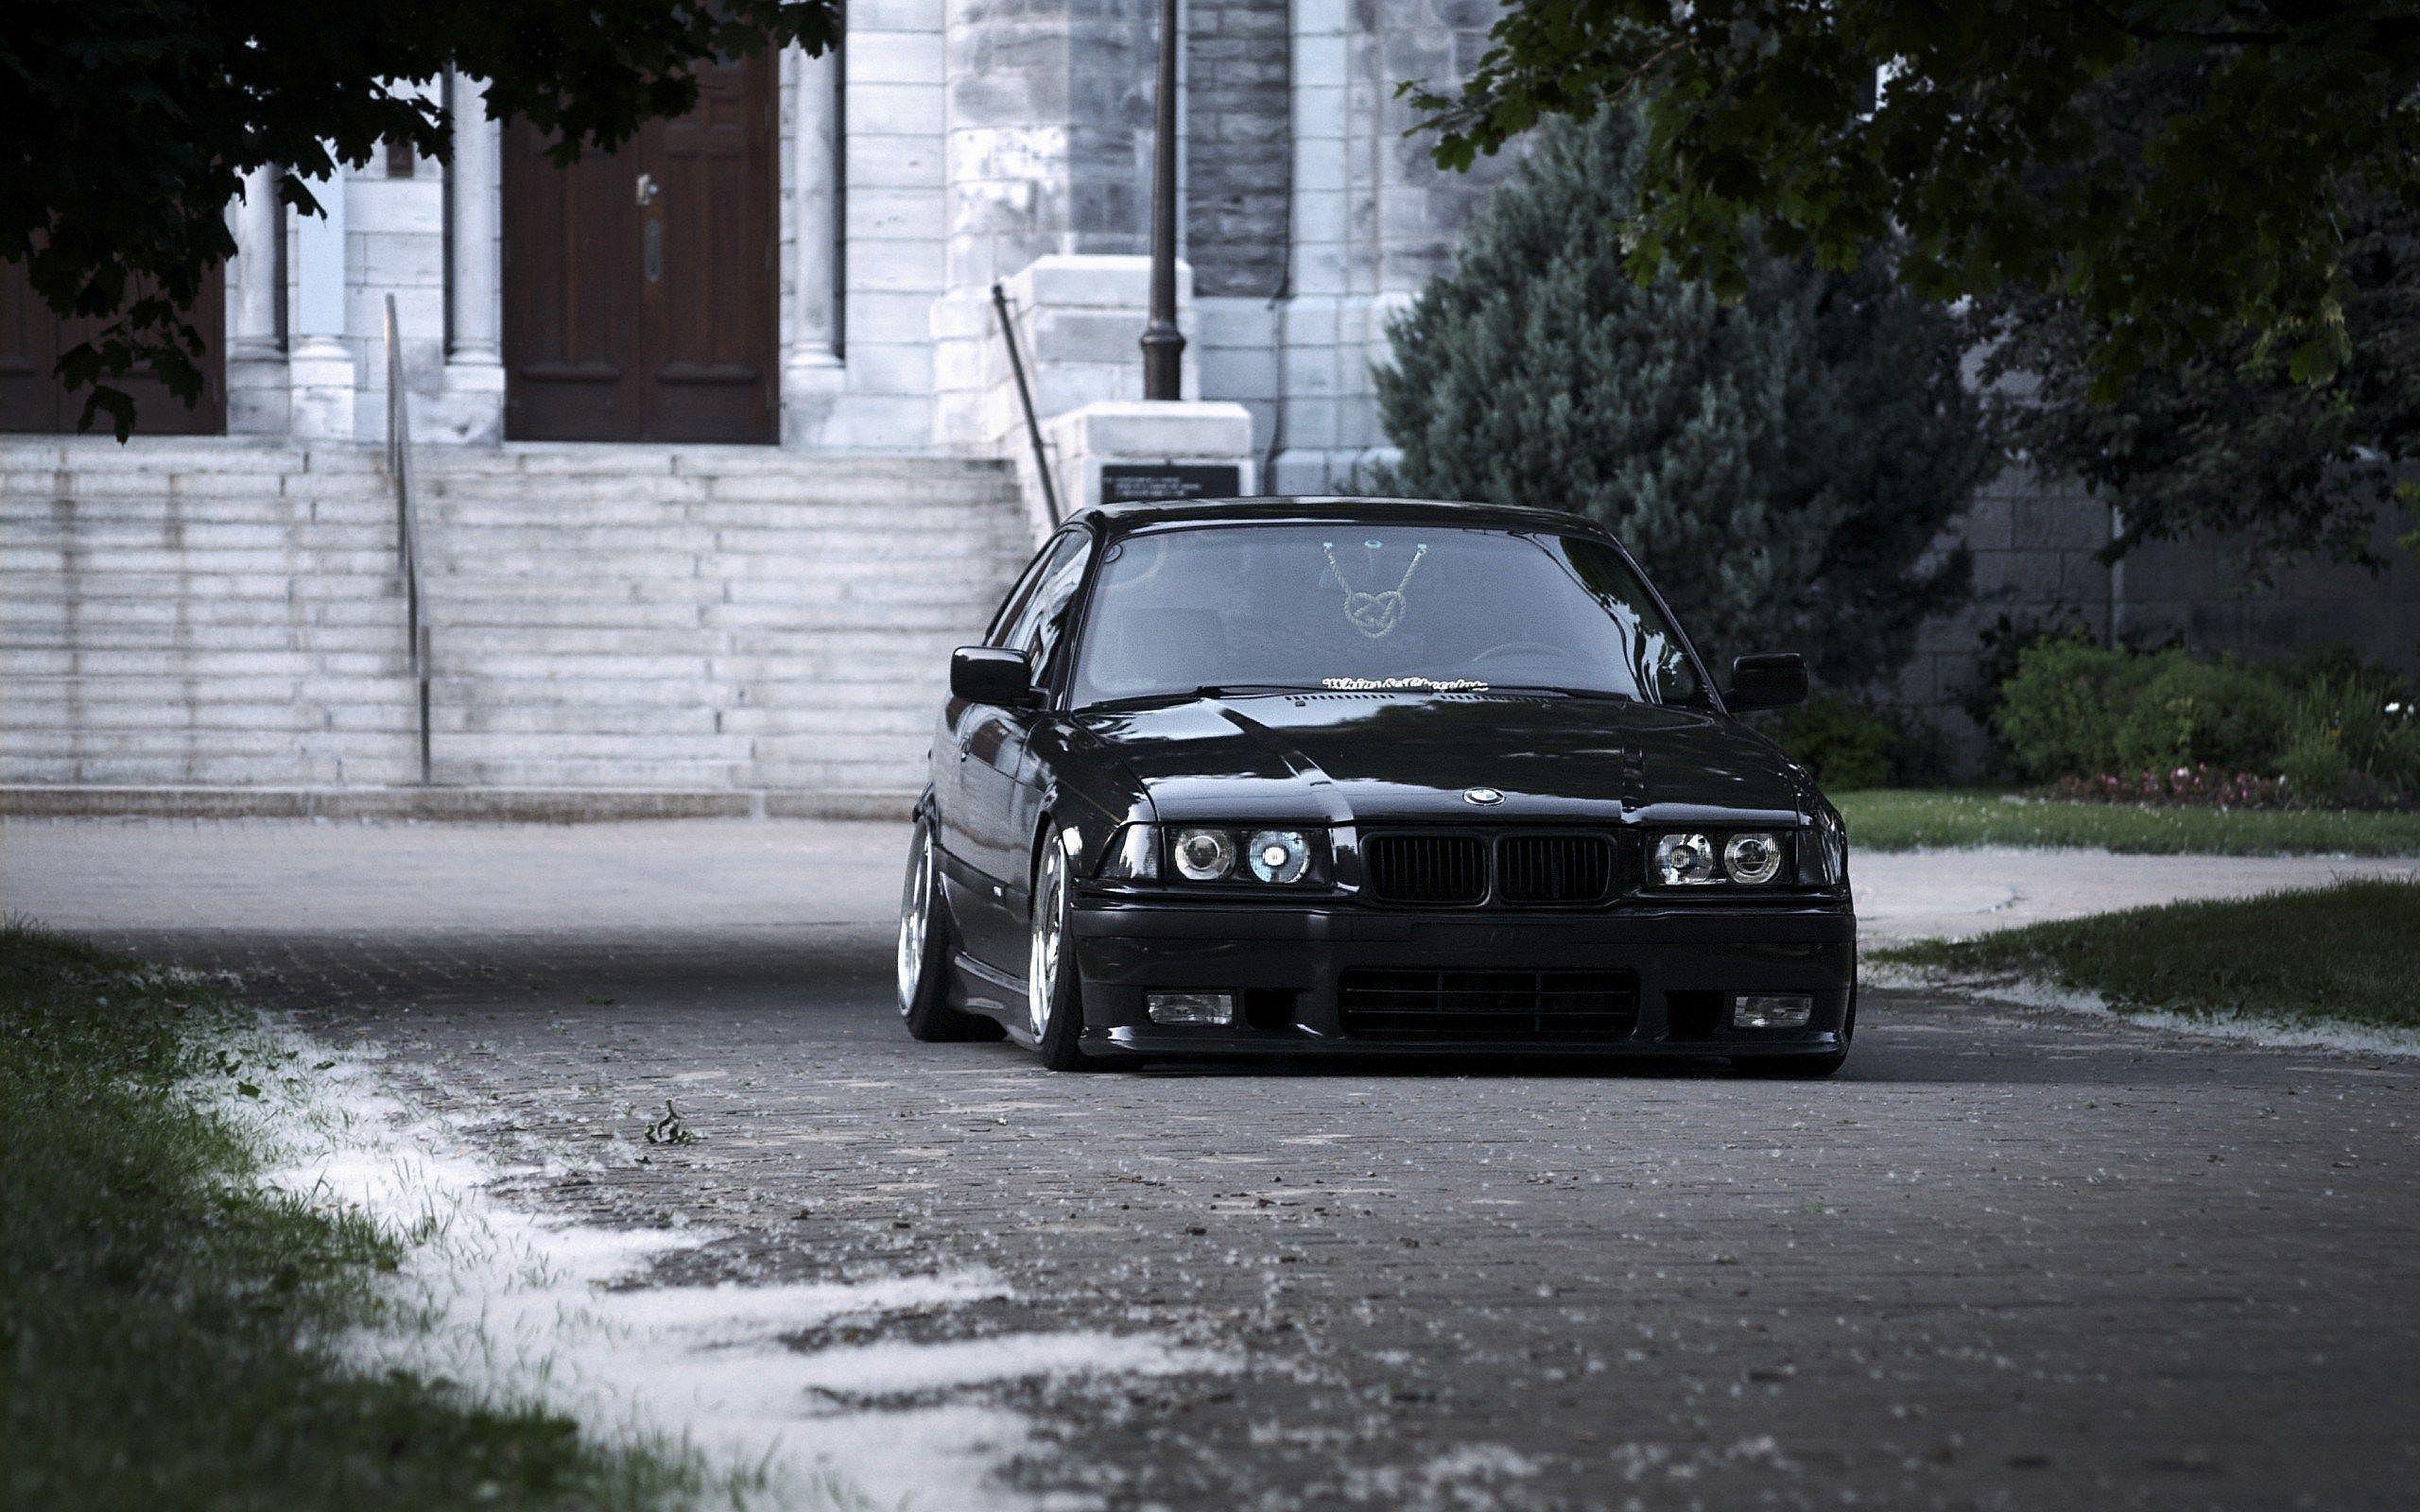 BMW E36 M3 Wallpaper 64 images 2560x1600